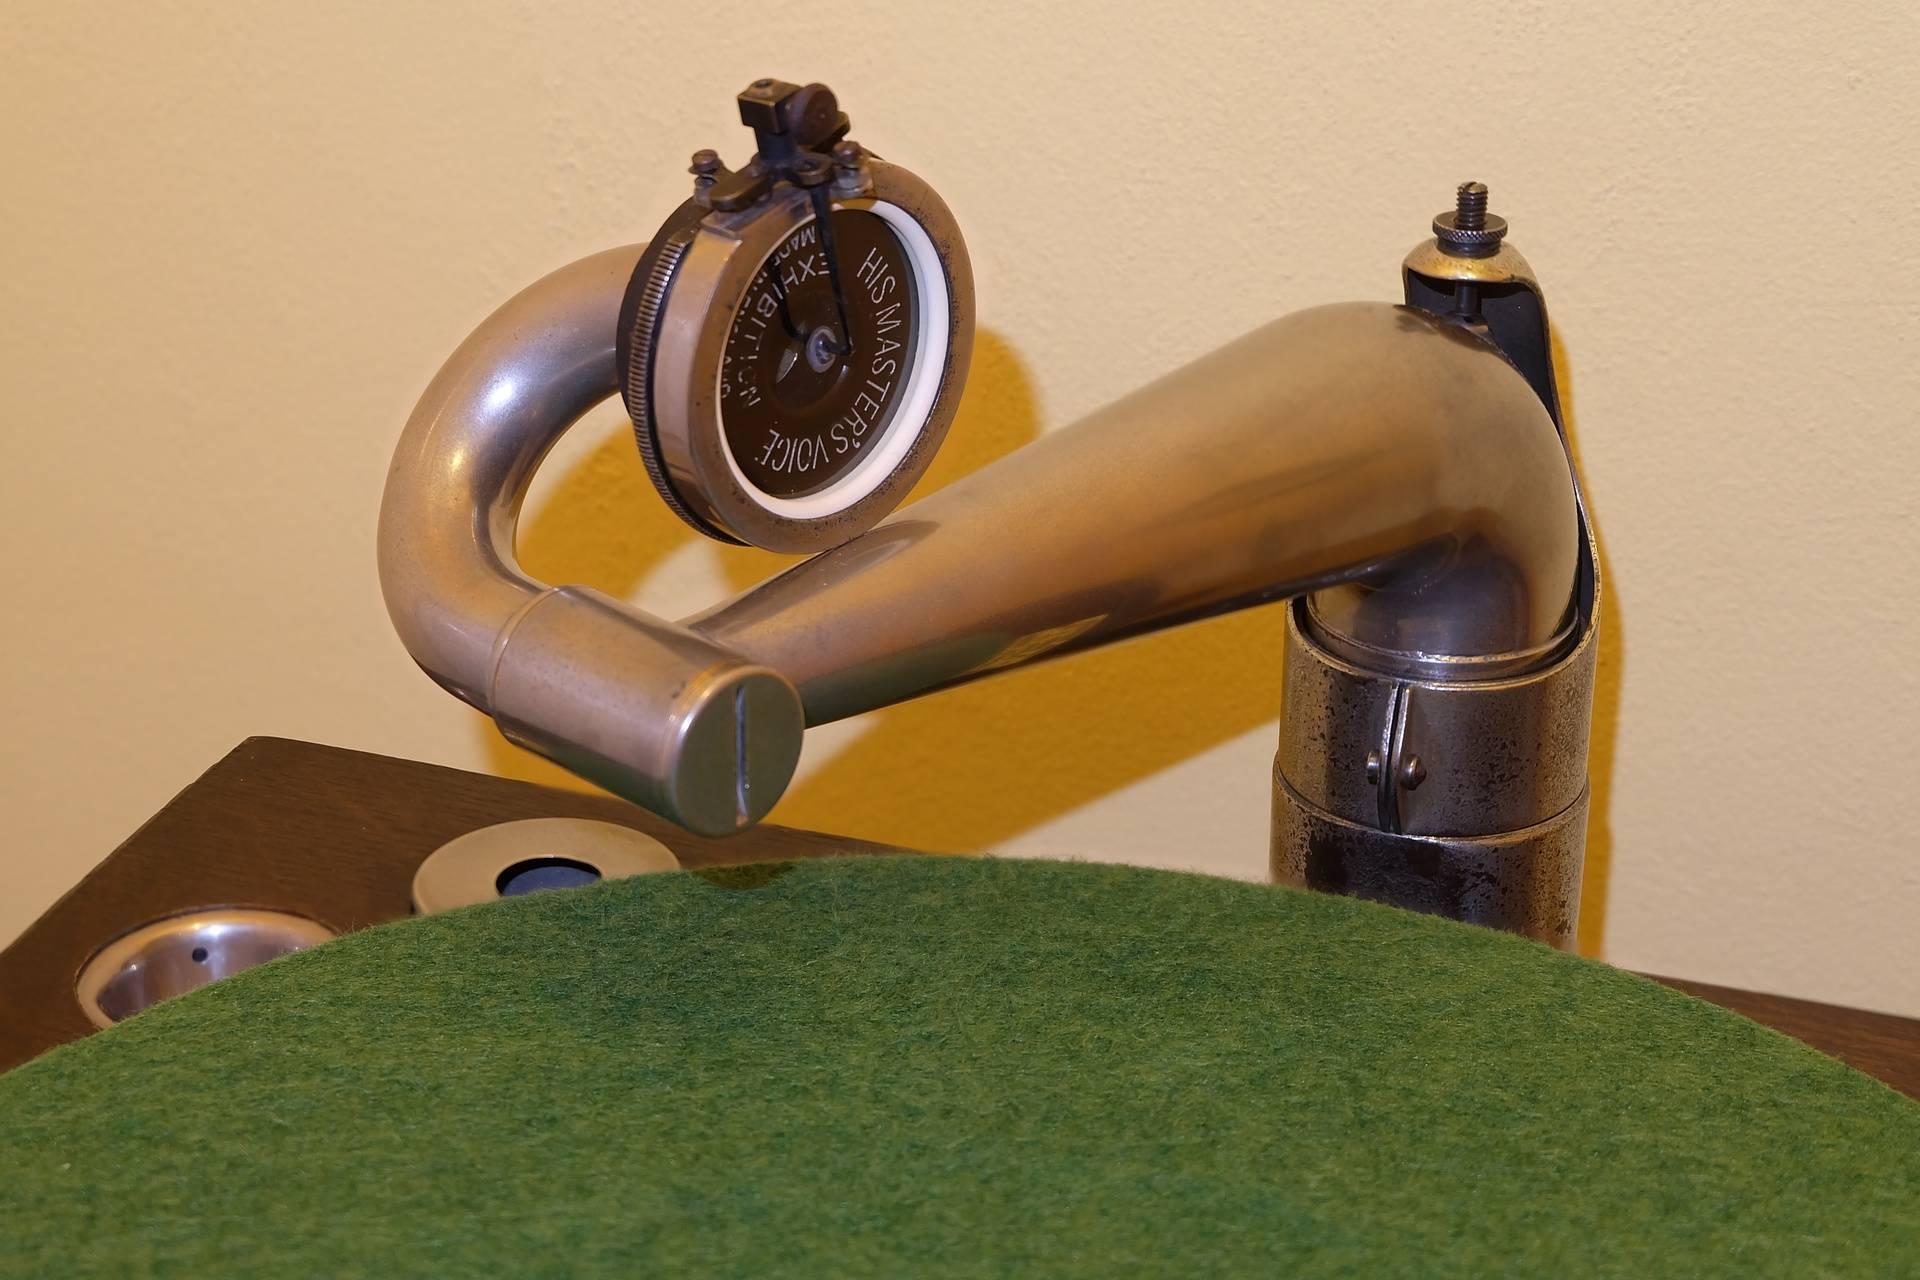 HMV58_005 Tone-arm detail